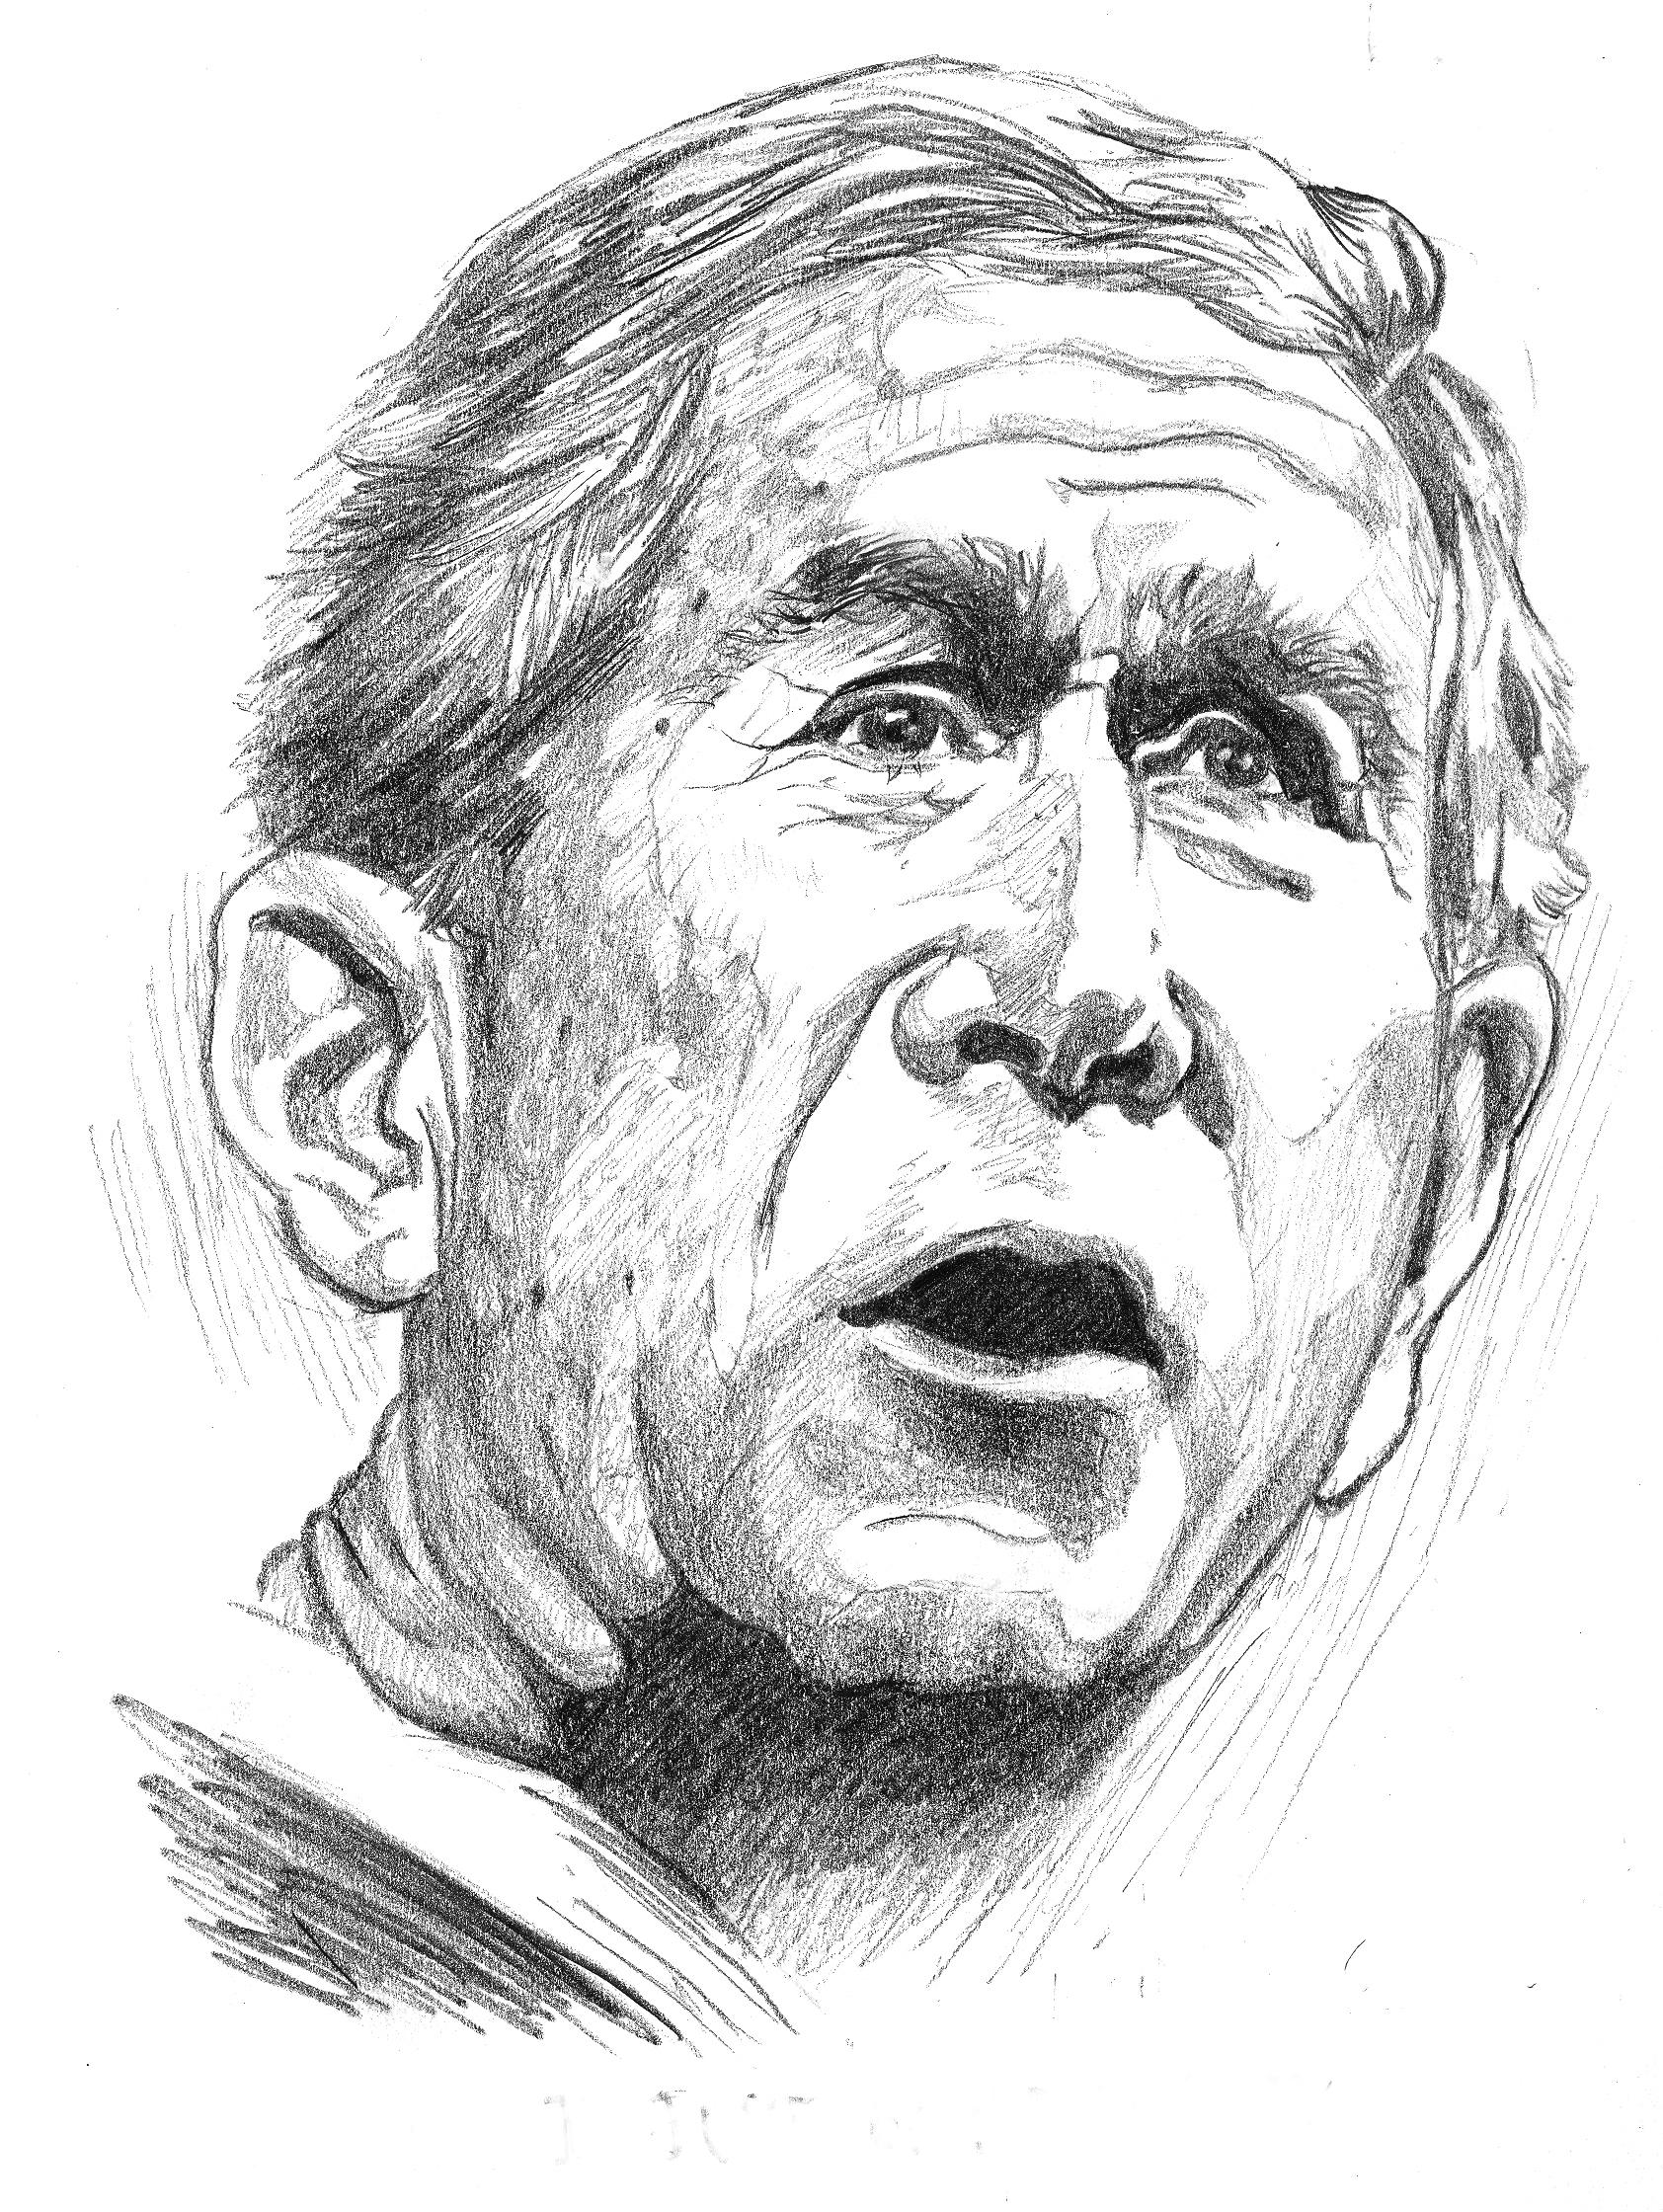 """Bush Caricature""   Pencil on Paper"